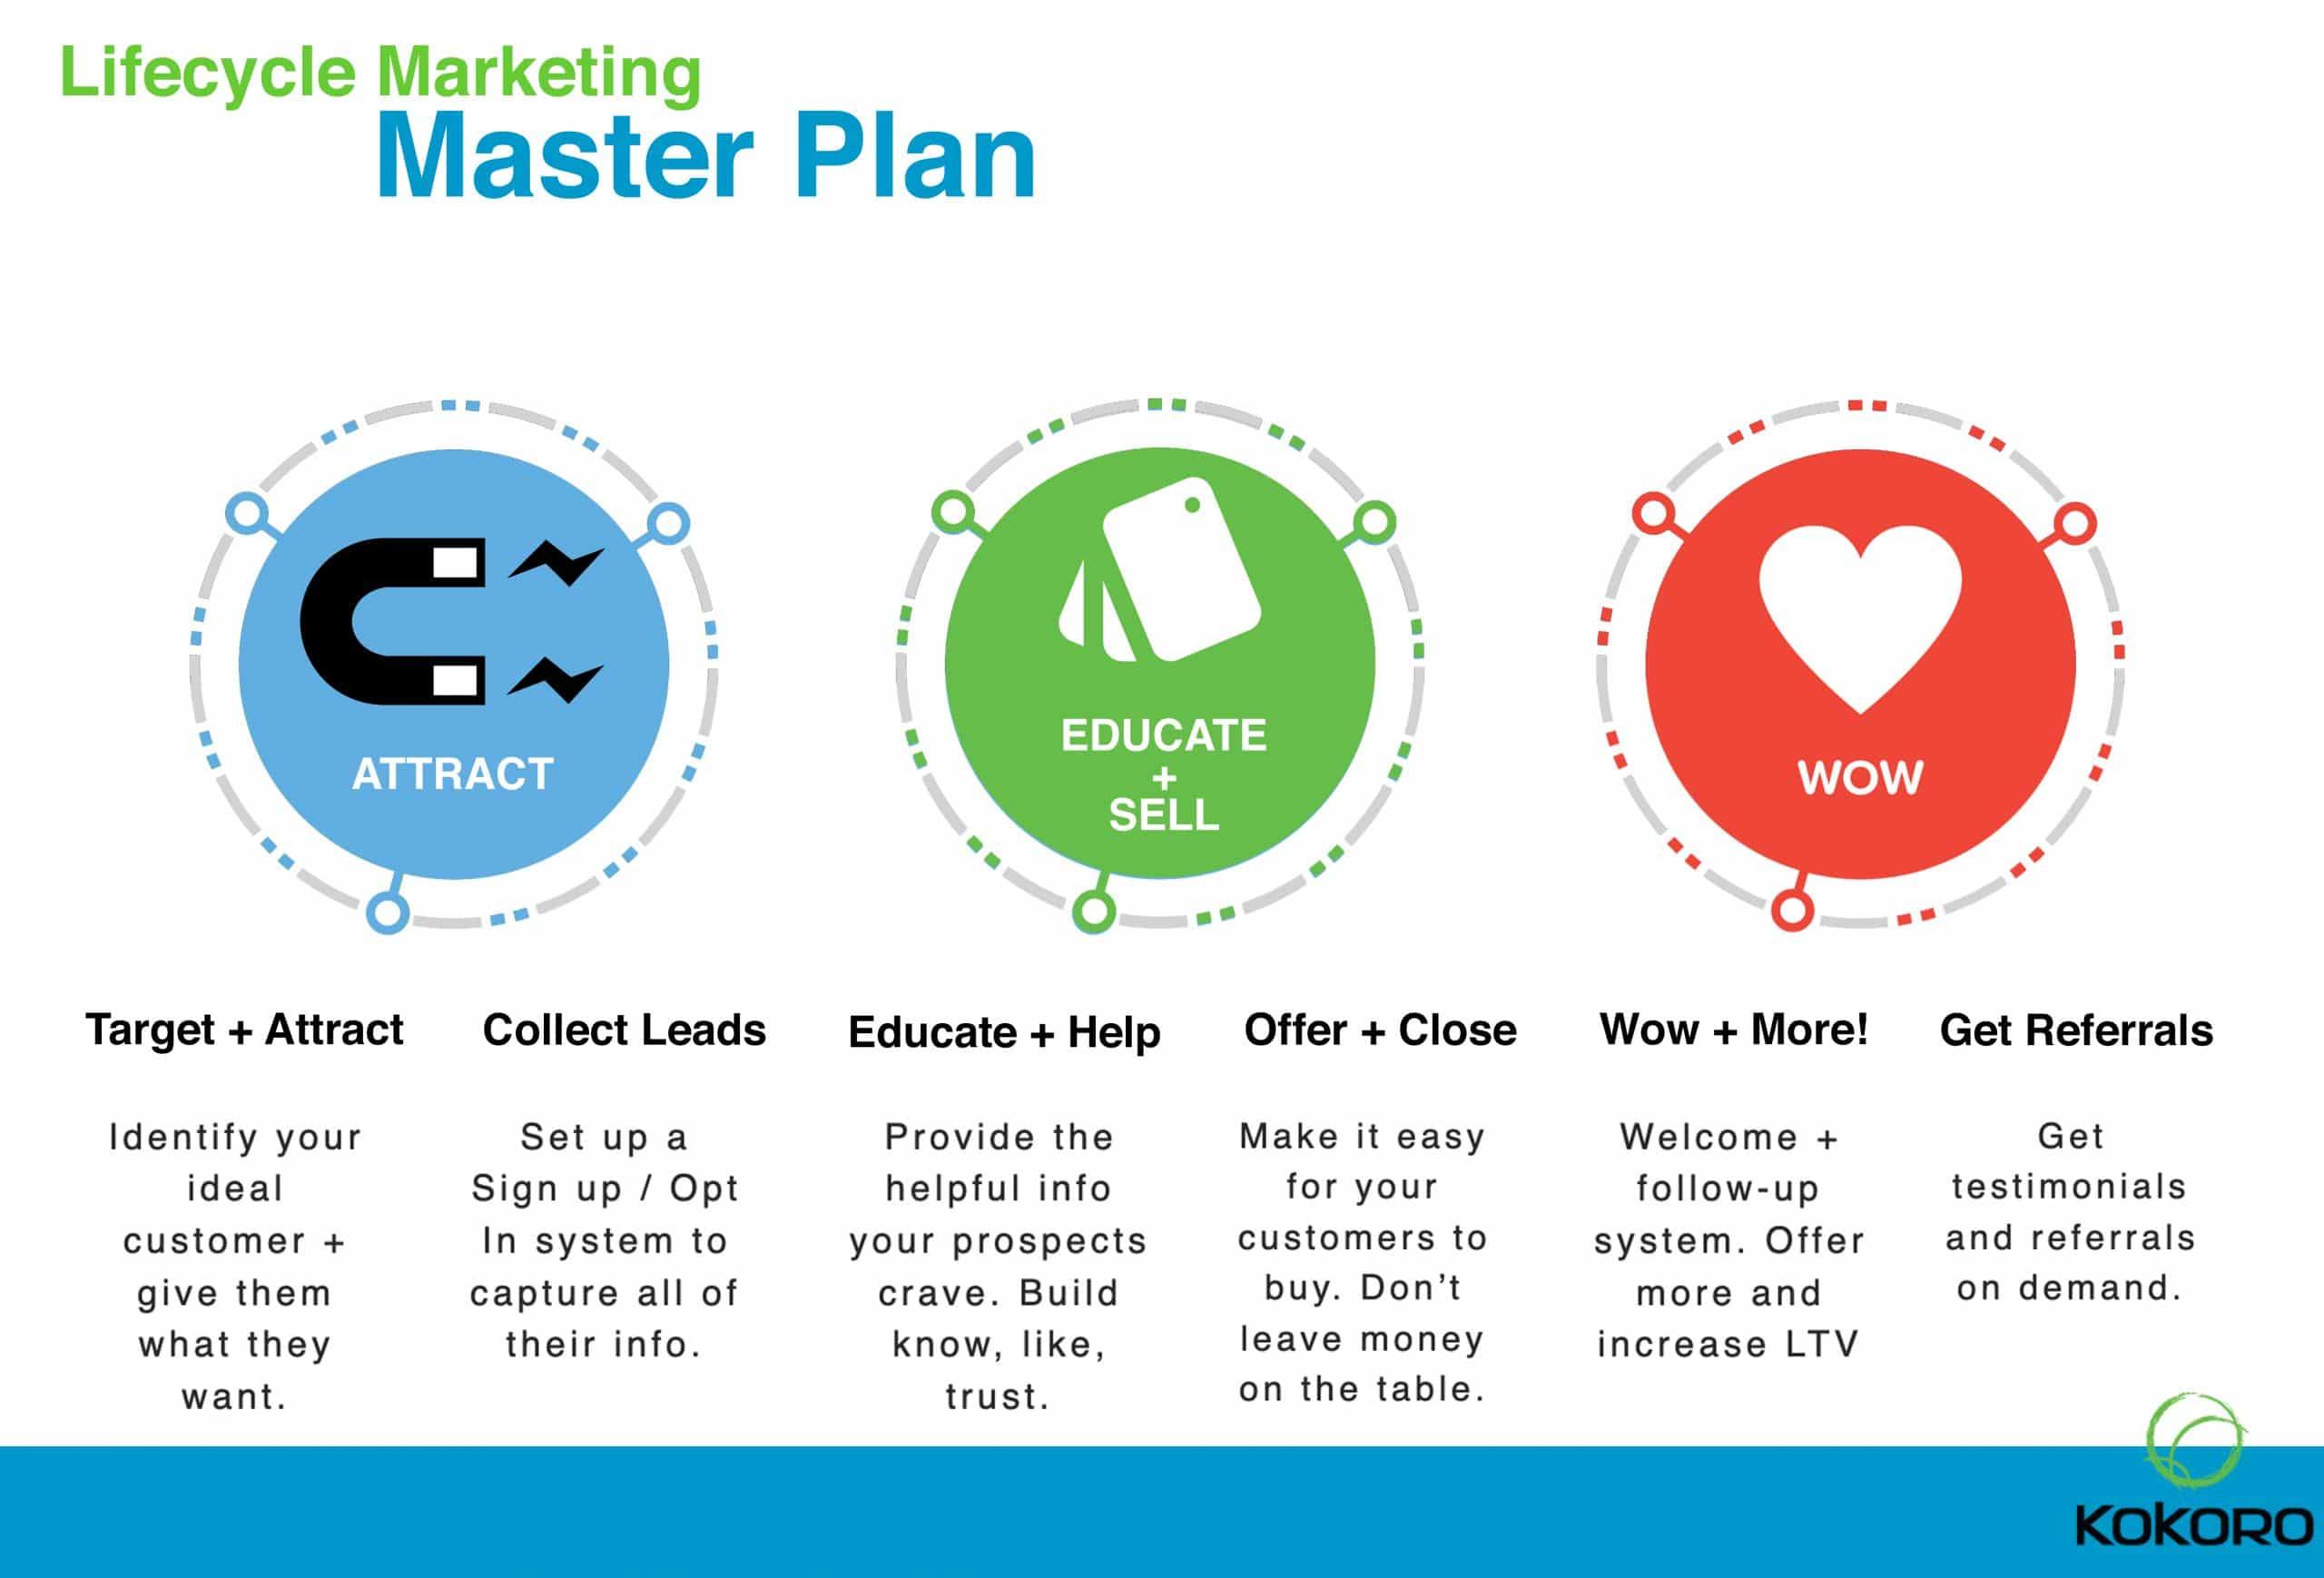 Kokoro Lifecycle Marketing Master Plan